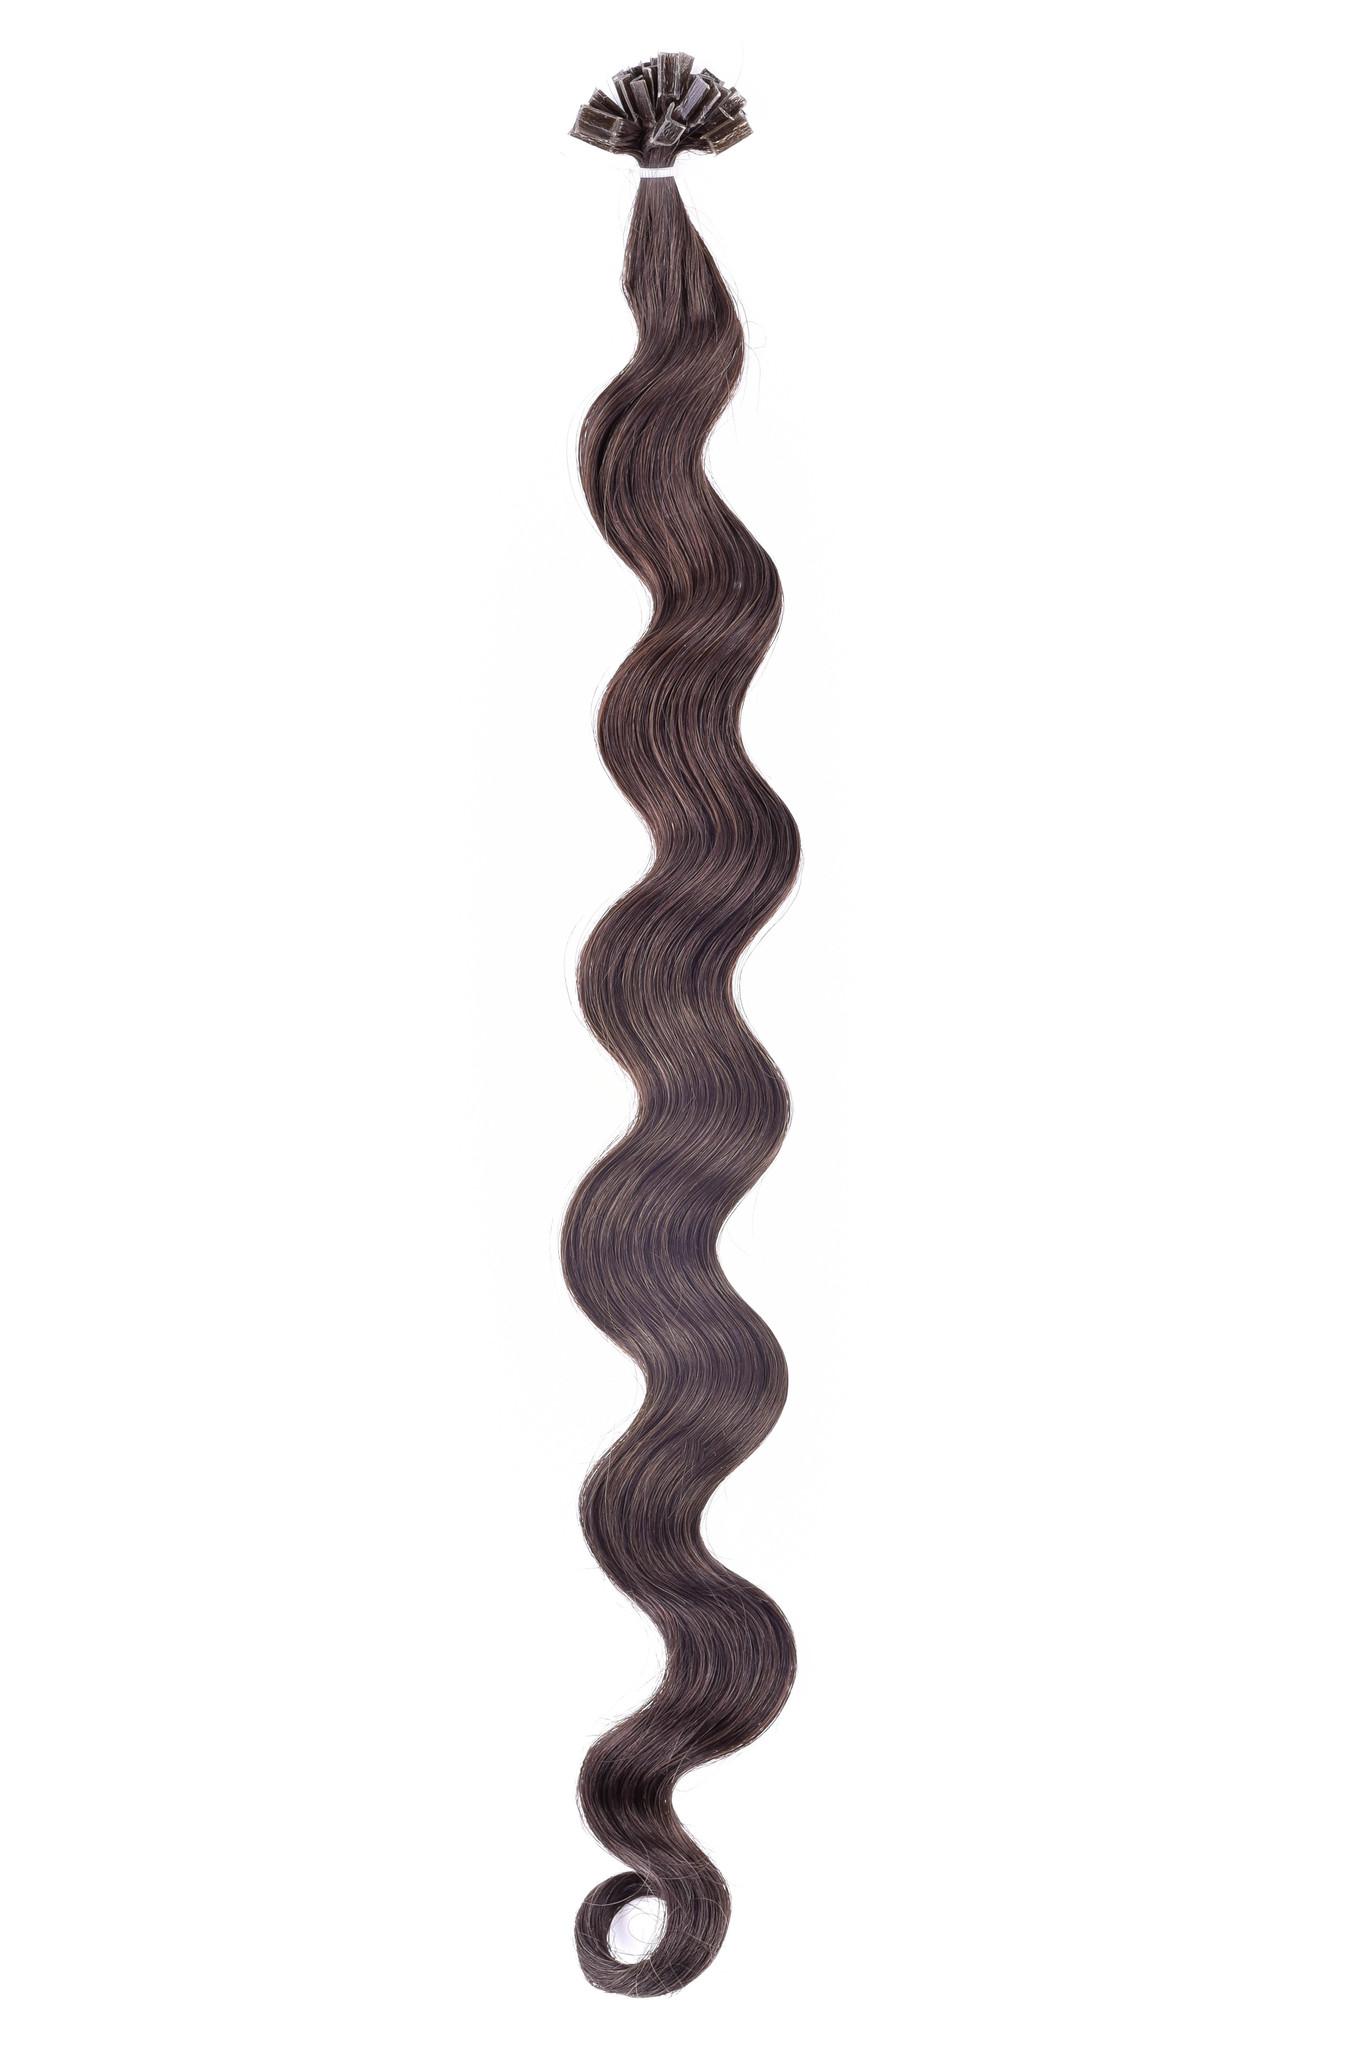 SilverFox Wax Extensions Loose Wave 55cm #24 Warm Light Blonde